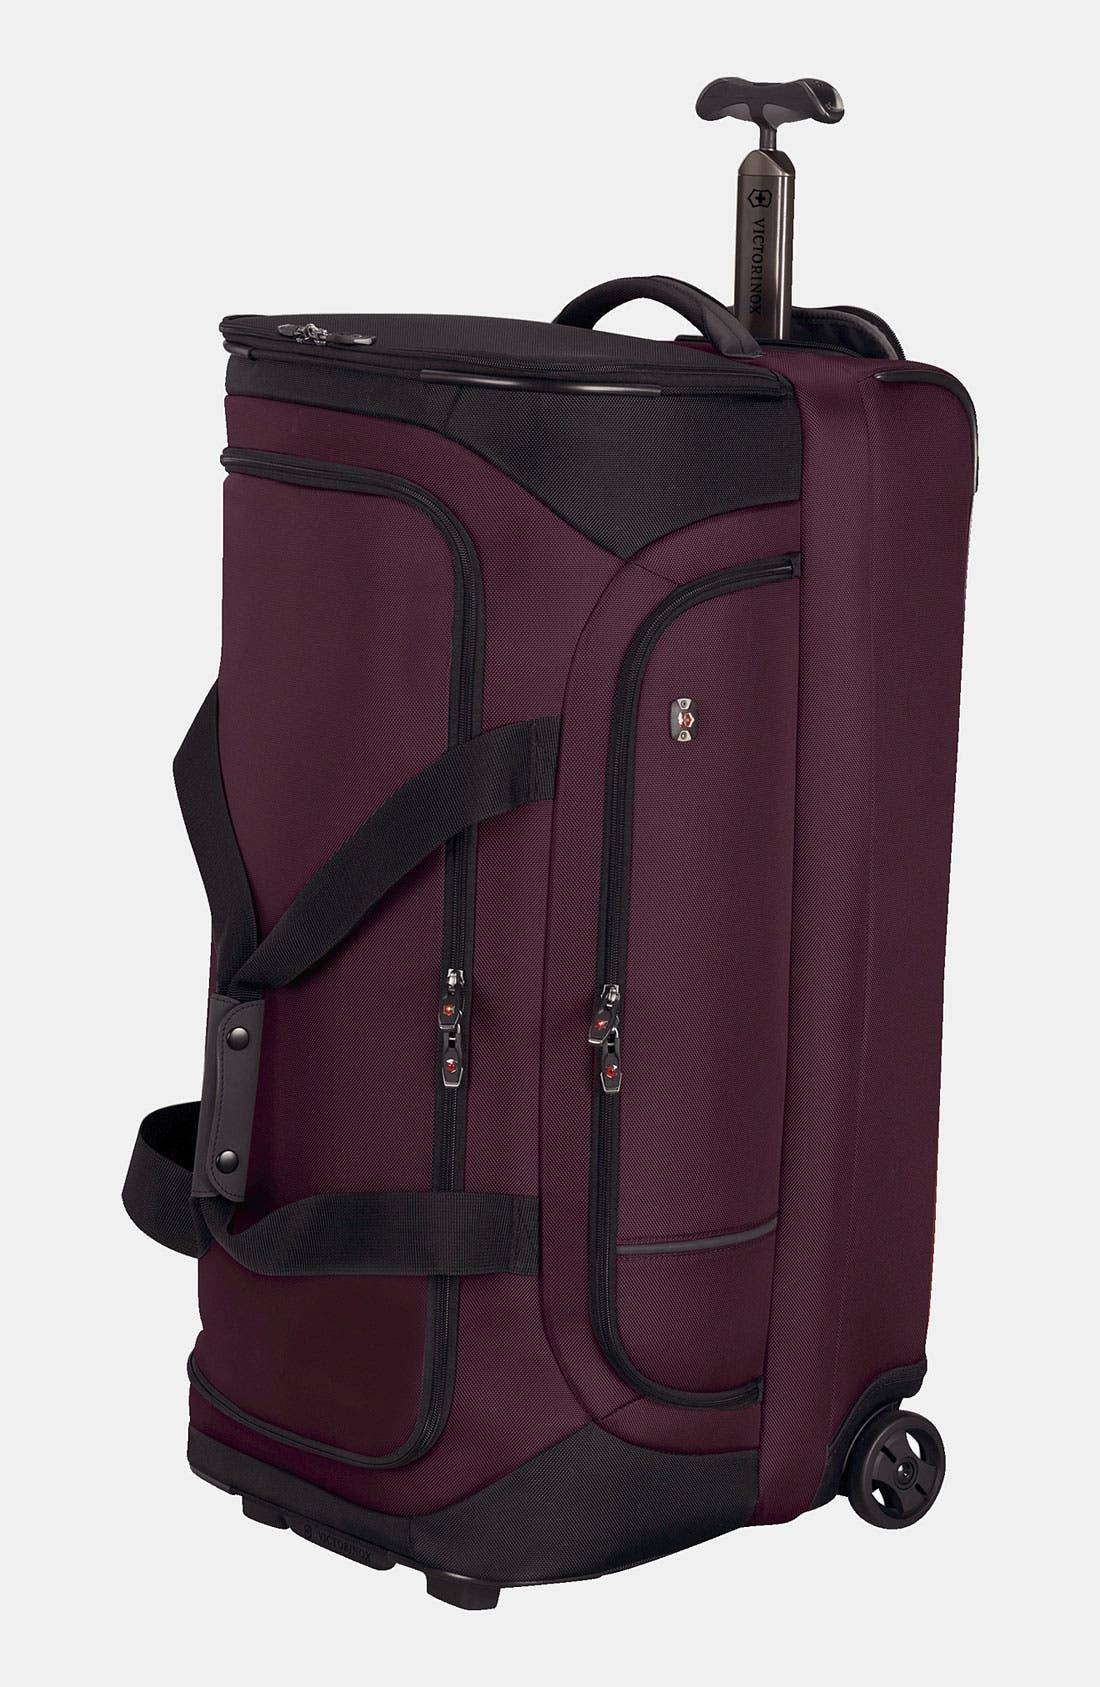 Main Image - Victorinox Swiss Army® 'Werks - Traveler' Rolling Duffel Bag (31 Inch)